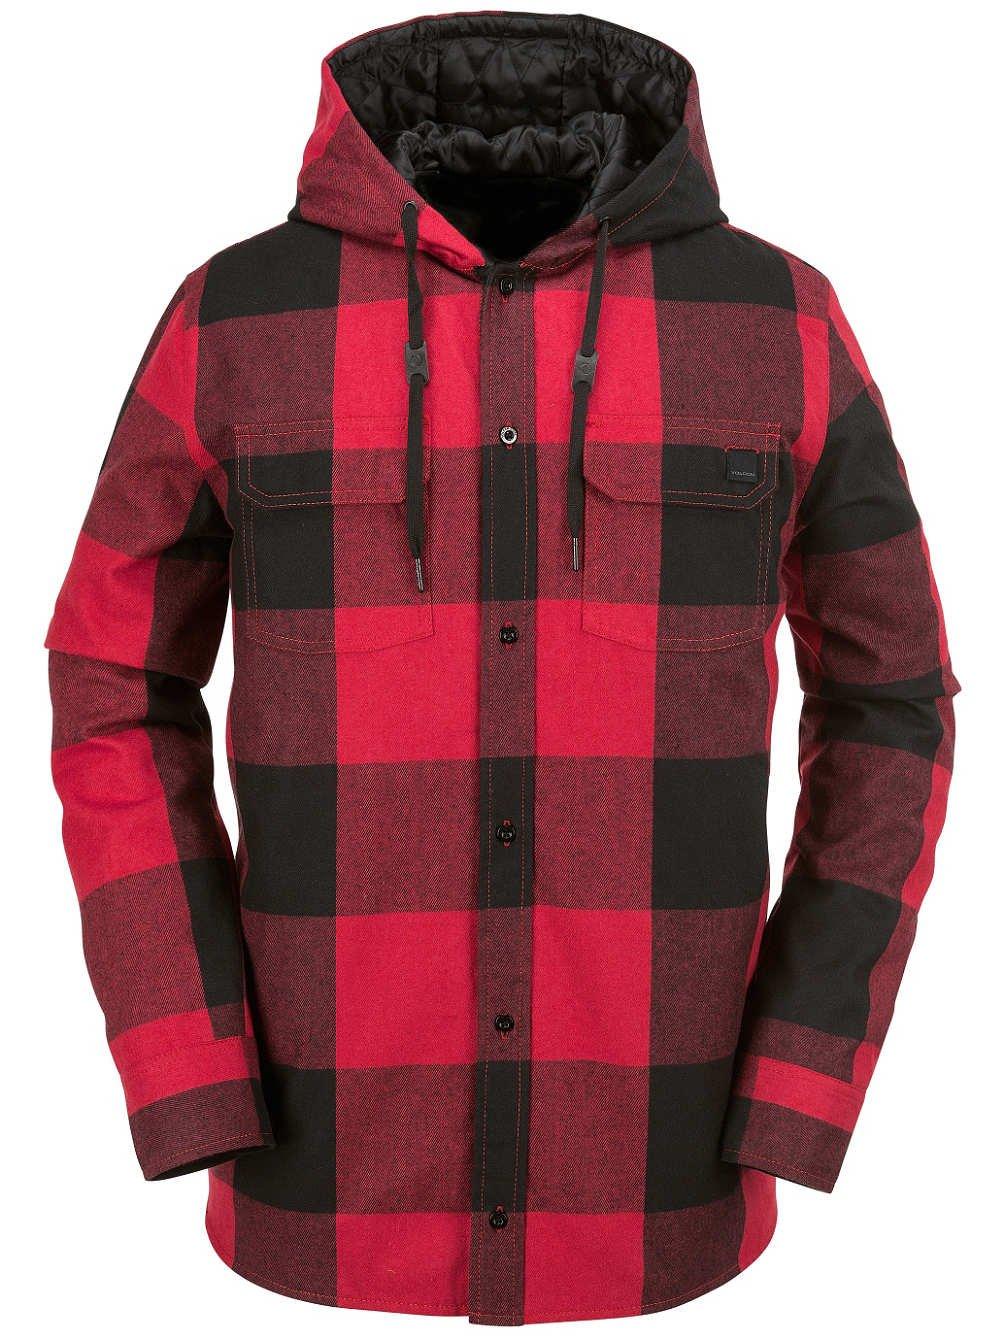 Herren Snowboard Jacke Volcom Burl Ins Flannel Jacket